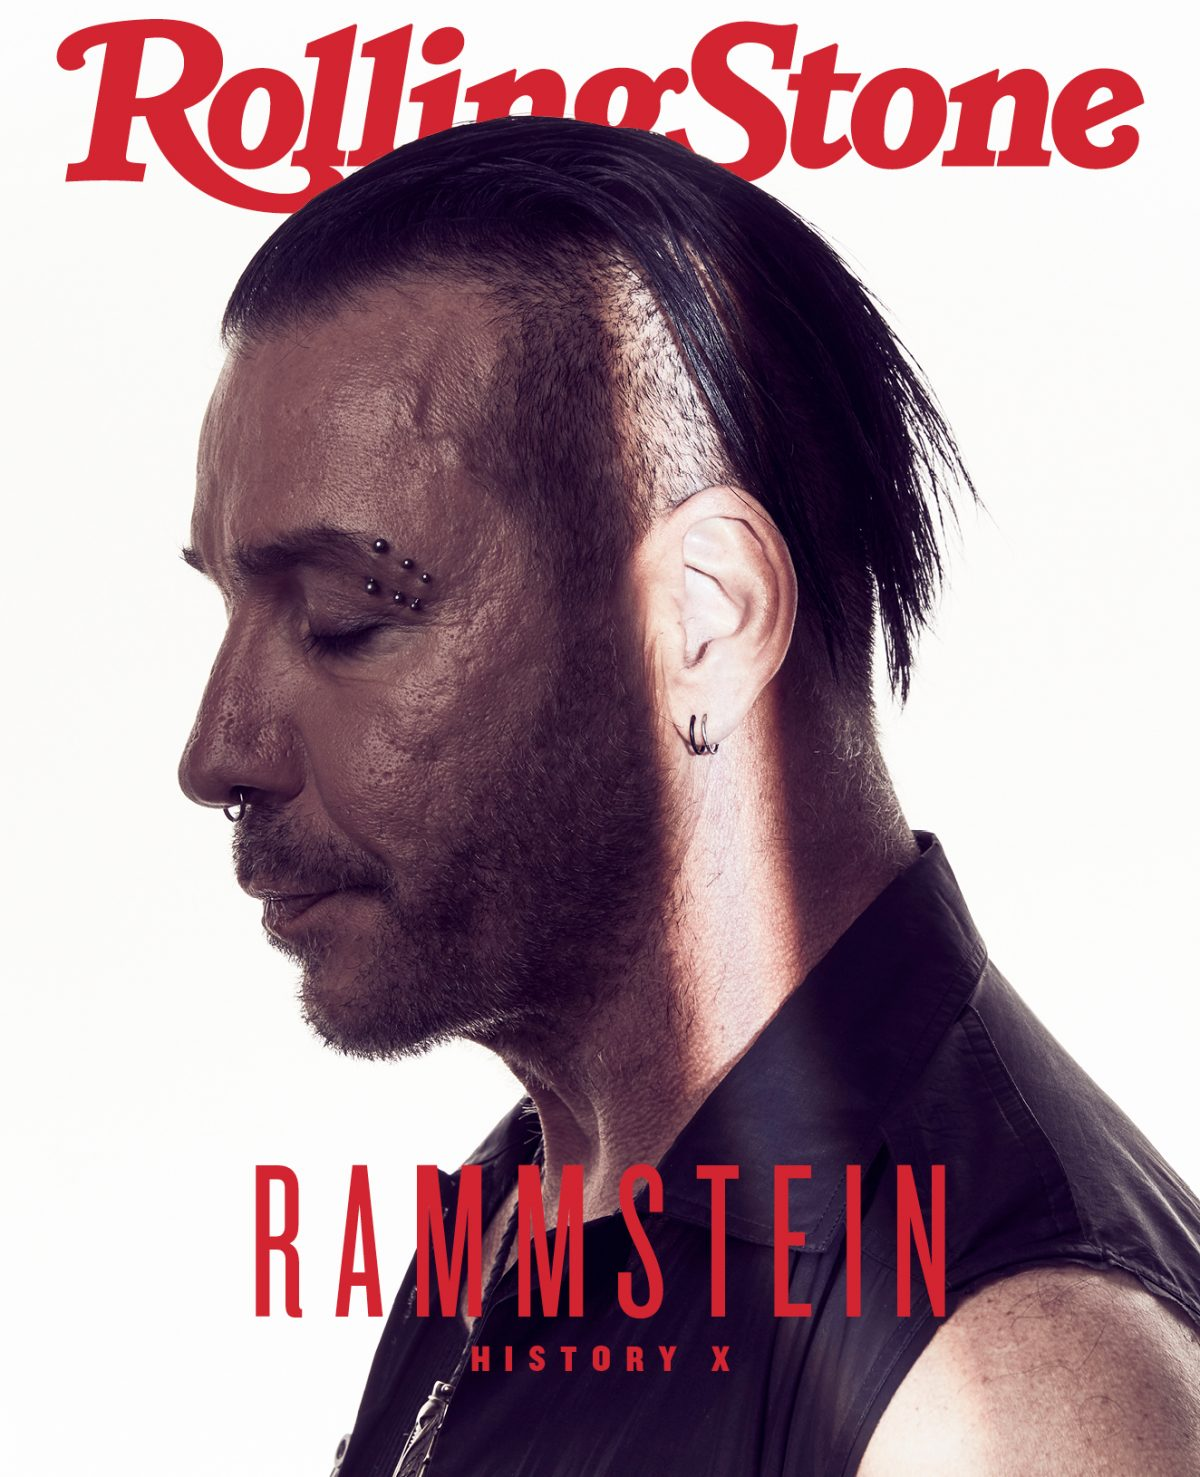 I Rammstein sulla copertina digitale di Rolling Stone